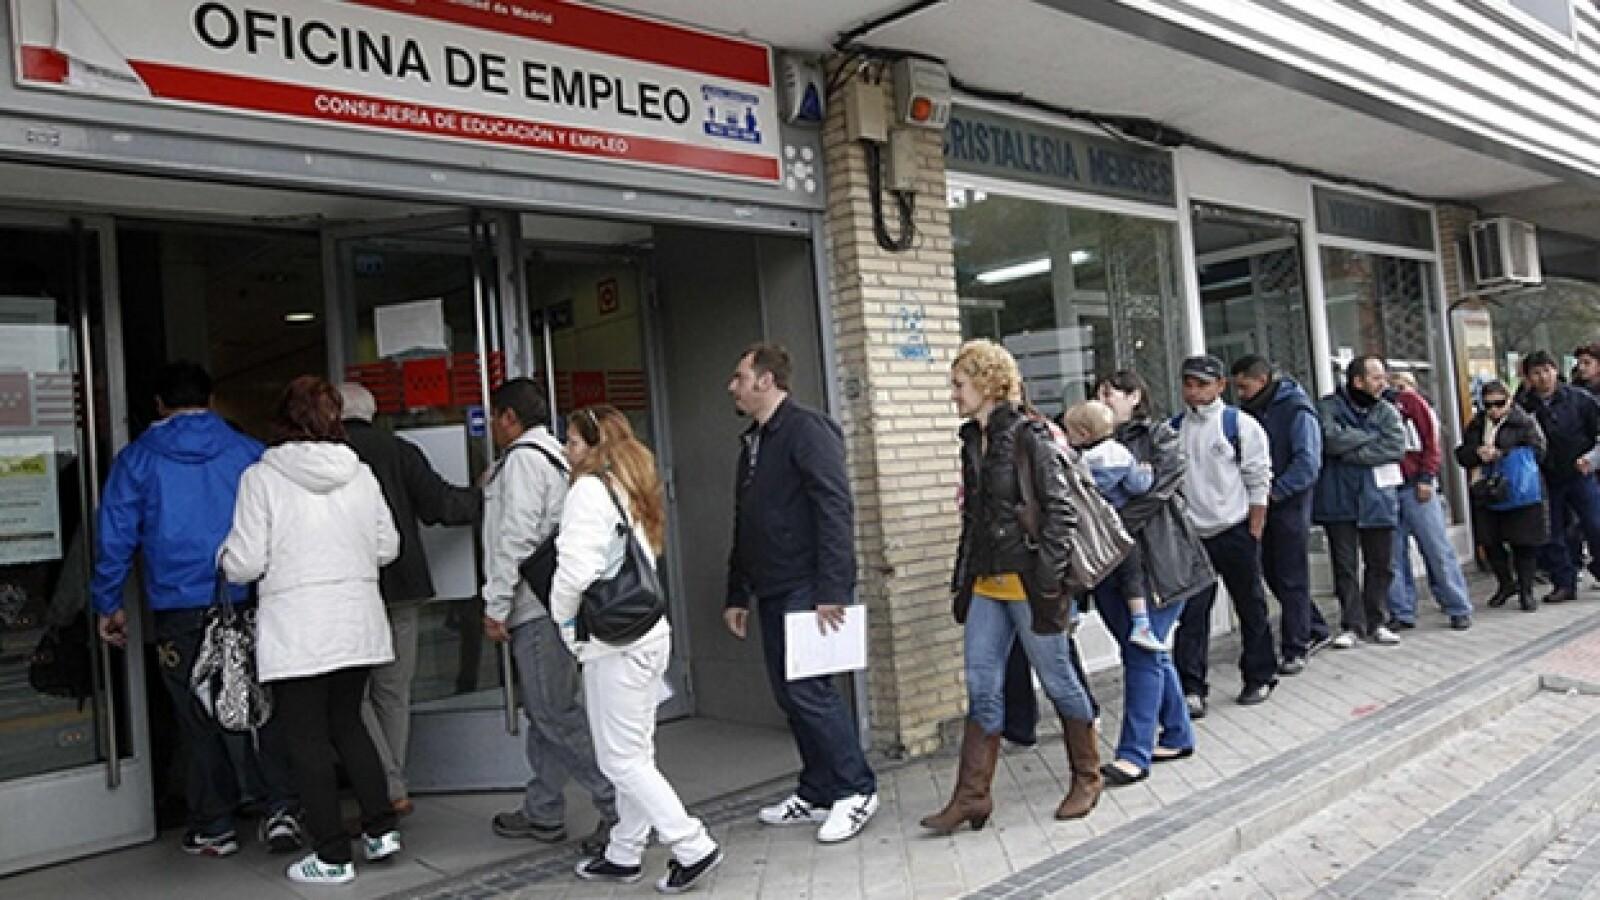 España, crisis, paro laboral